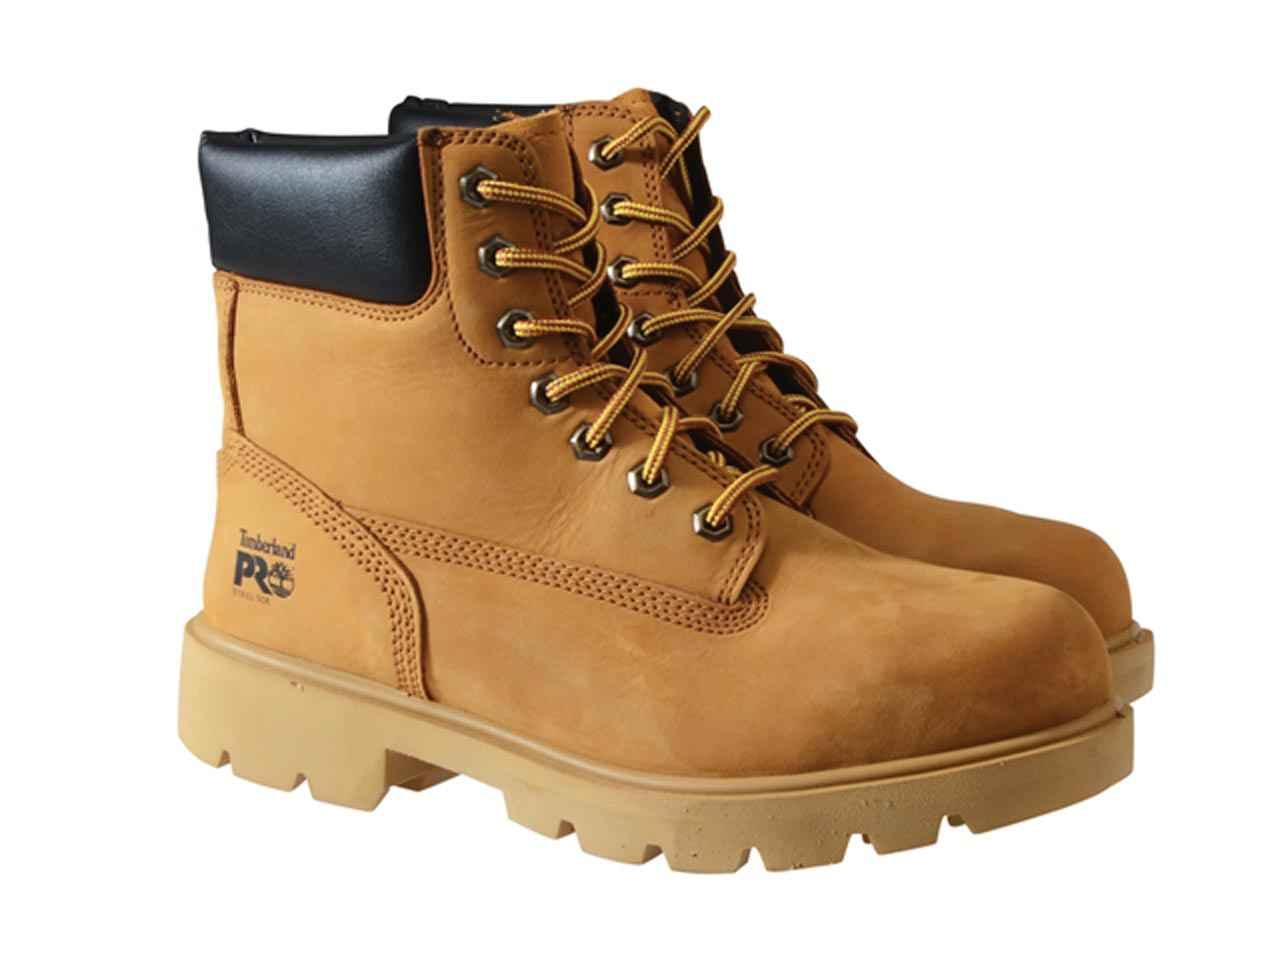 Dewalt Sharpsburg Sb Wheat Hiker Boots Uk 7 Euro 41 Yard, Garden & Outdoor Living